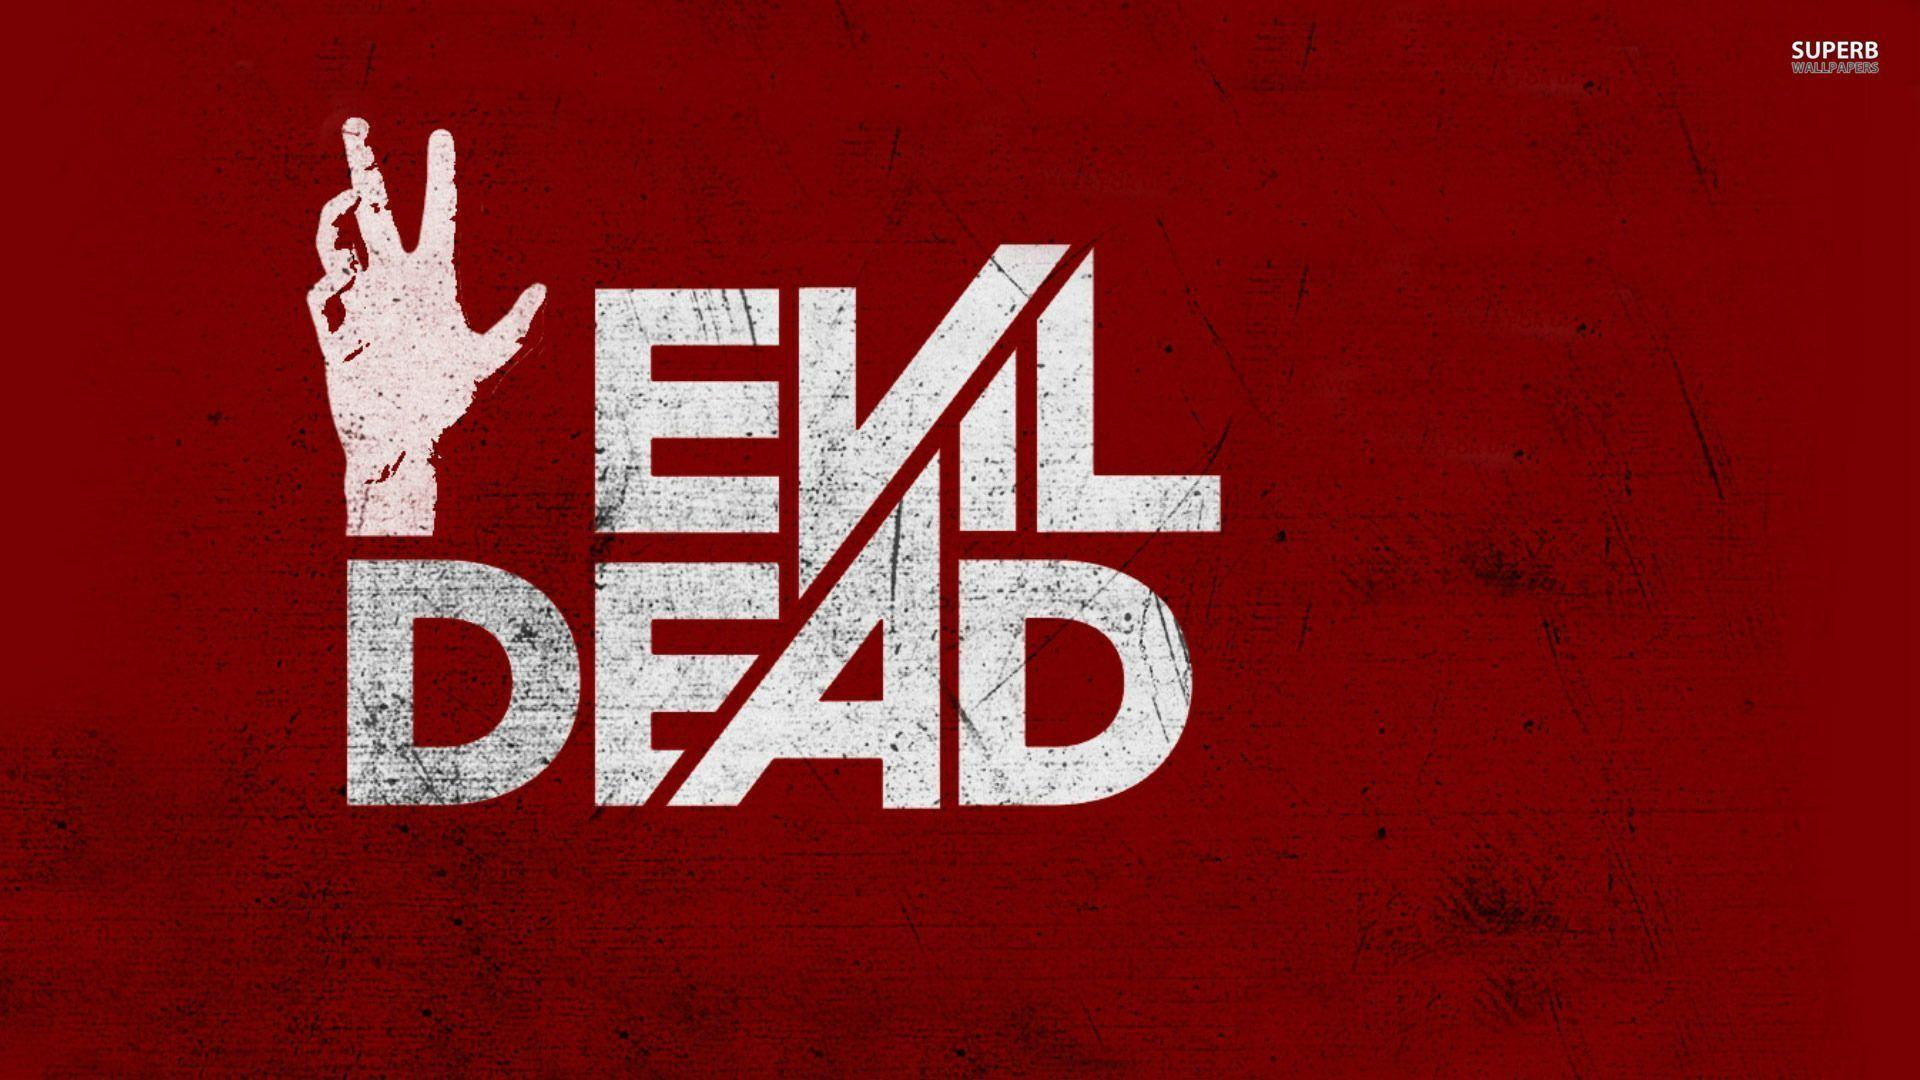 evil dead wallpaper 1920x1080 - photo #10